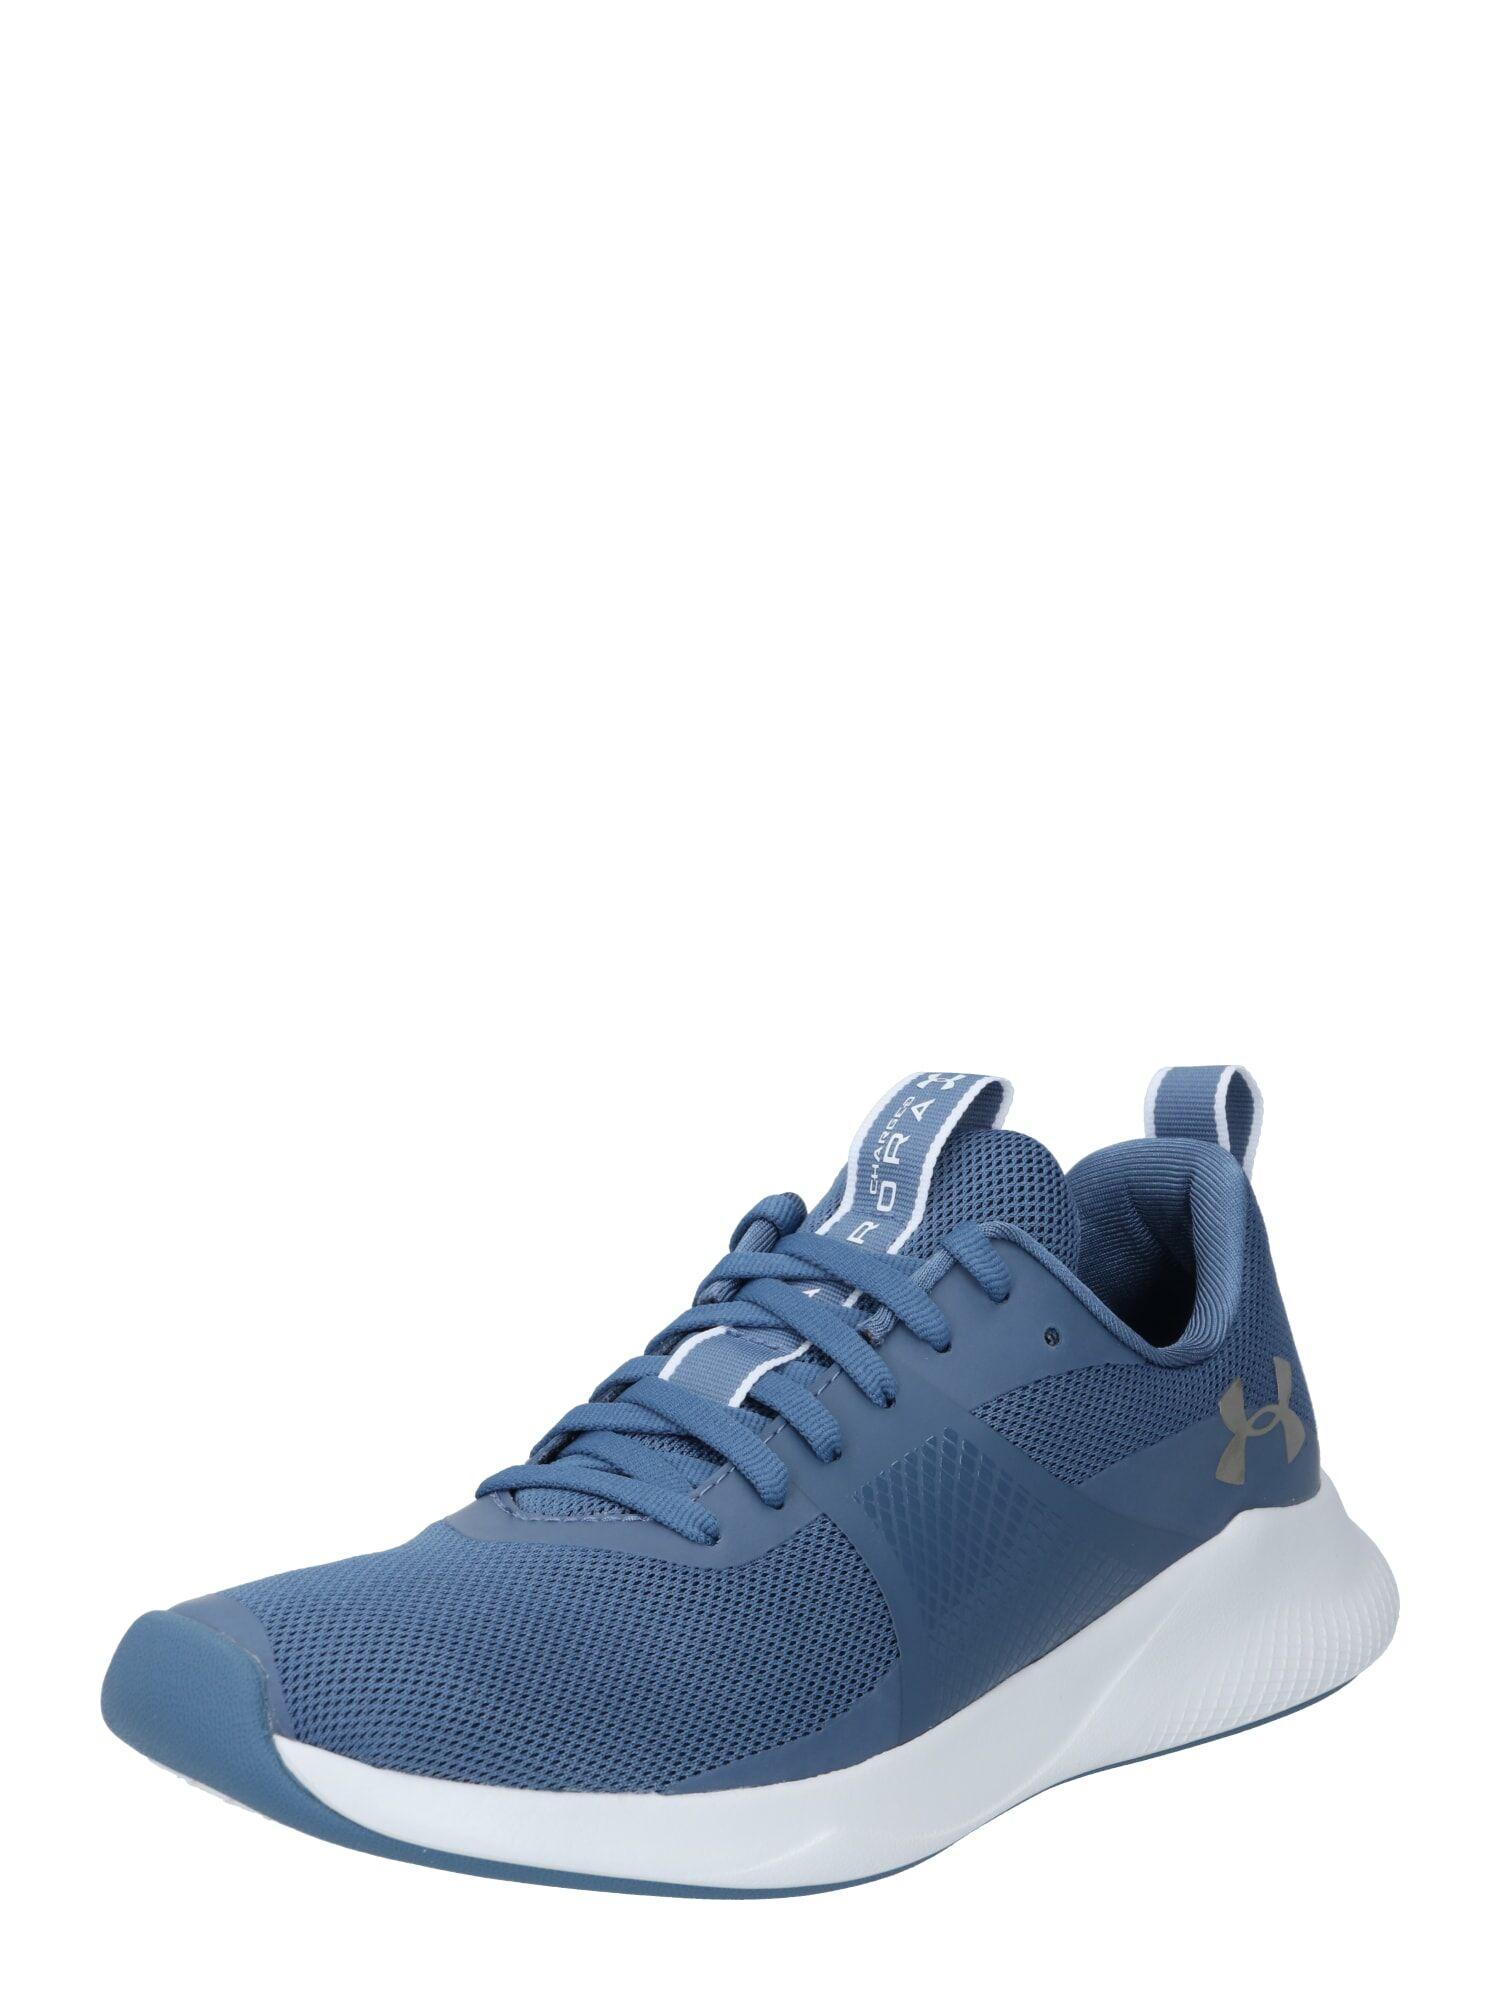 UNDER ARMOUR Chaussure de sport 'Aurora'  - Bleu - Taille: 7.5 - female